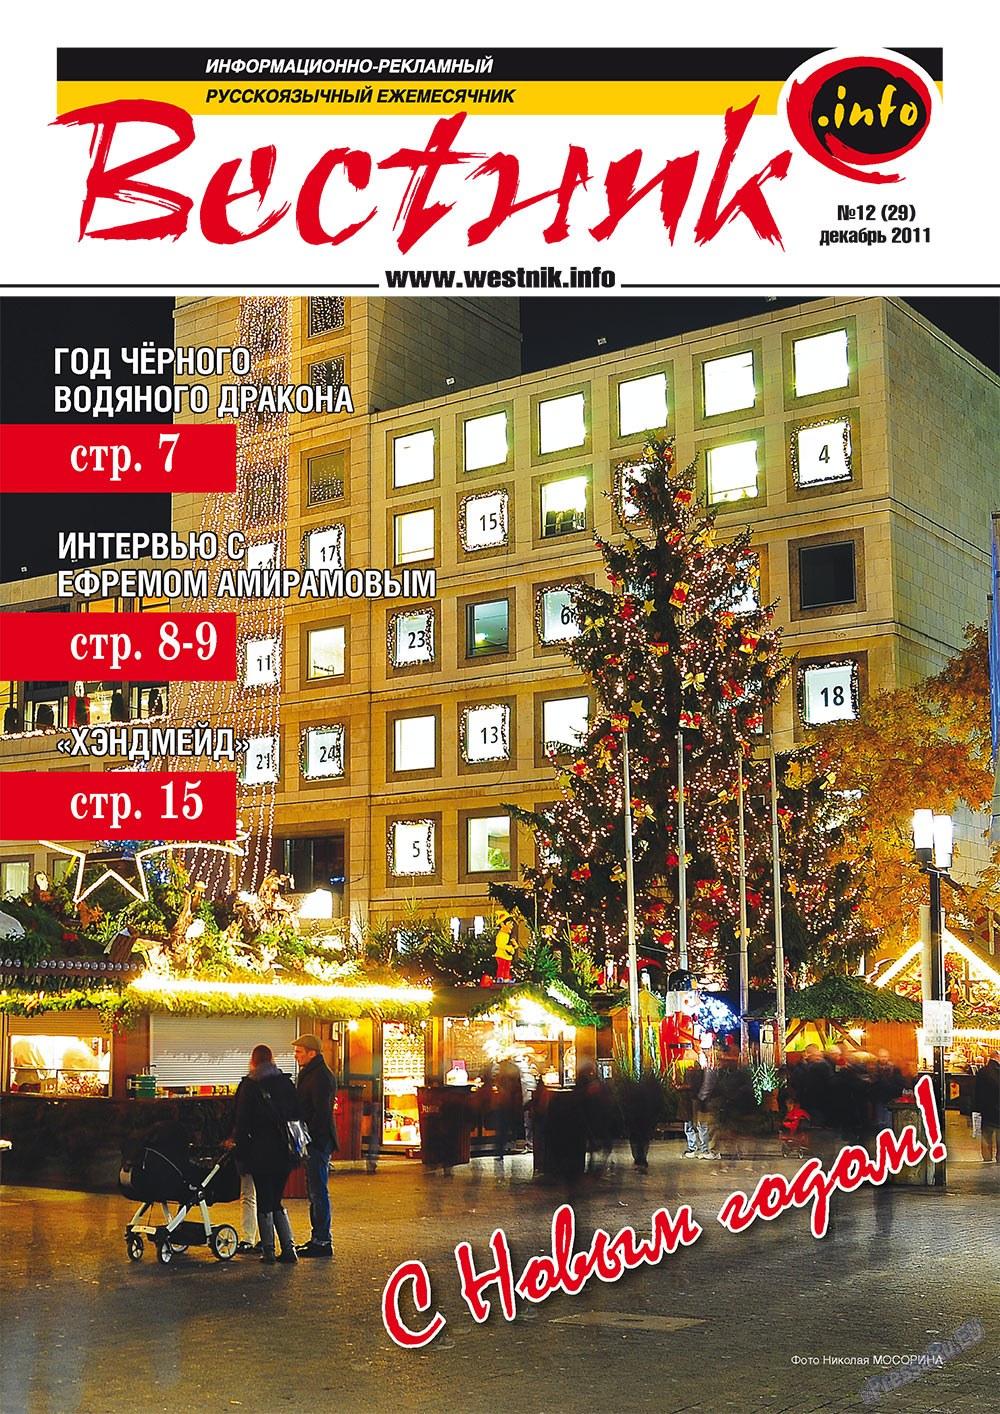 Вестник-info (журнал). 2011 год, номер 12, стр. 1